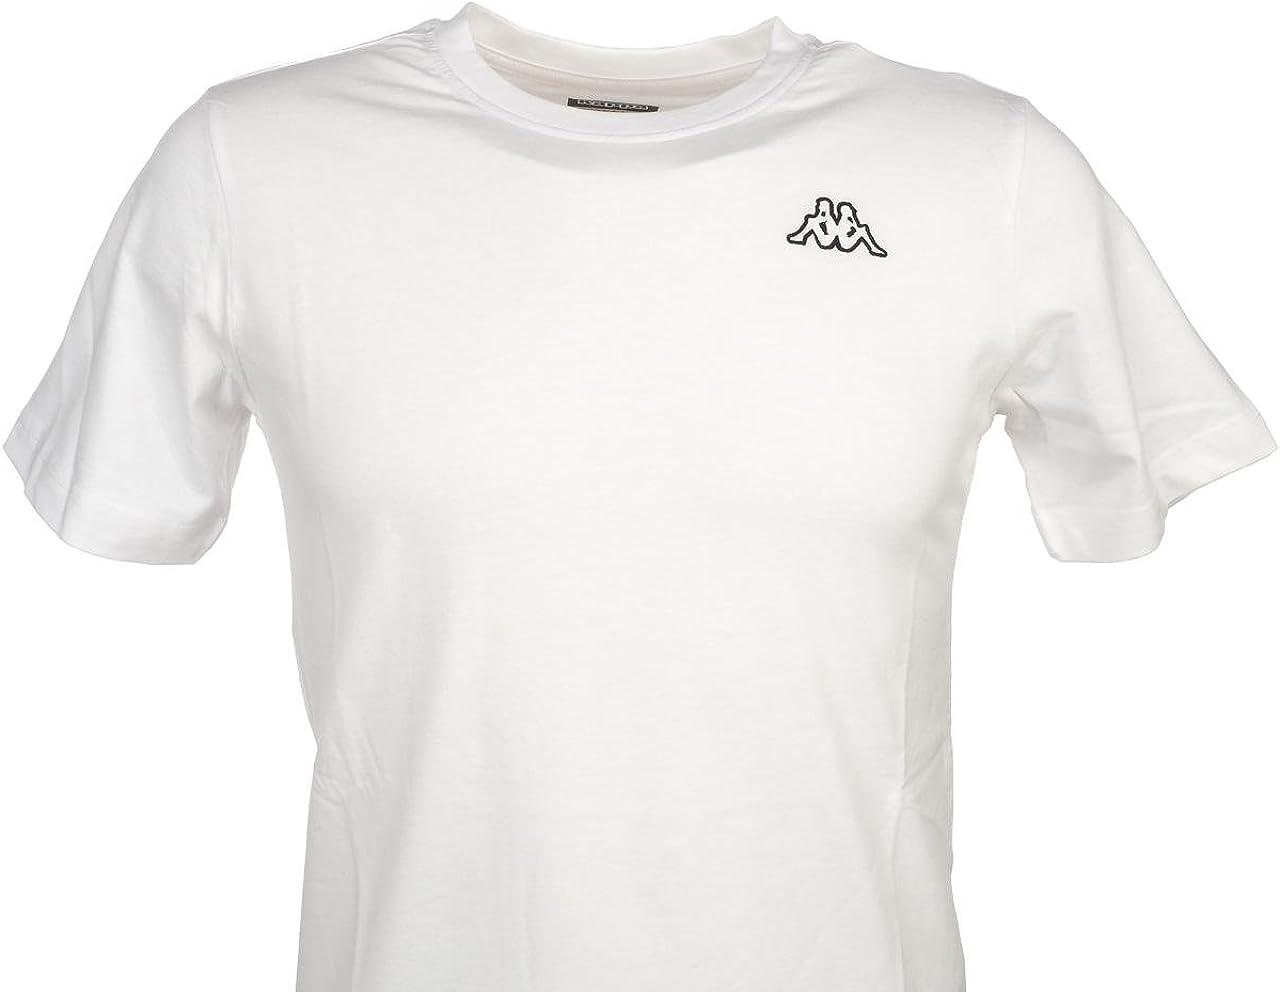 Kappa Cafers Slim tee Camiseta, Hombre